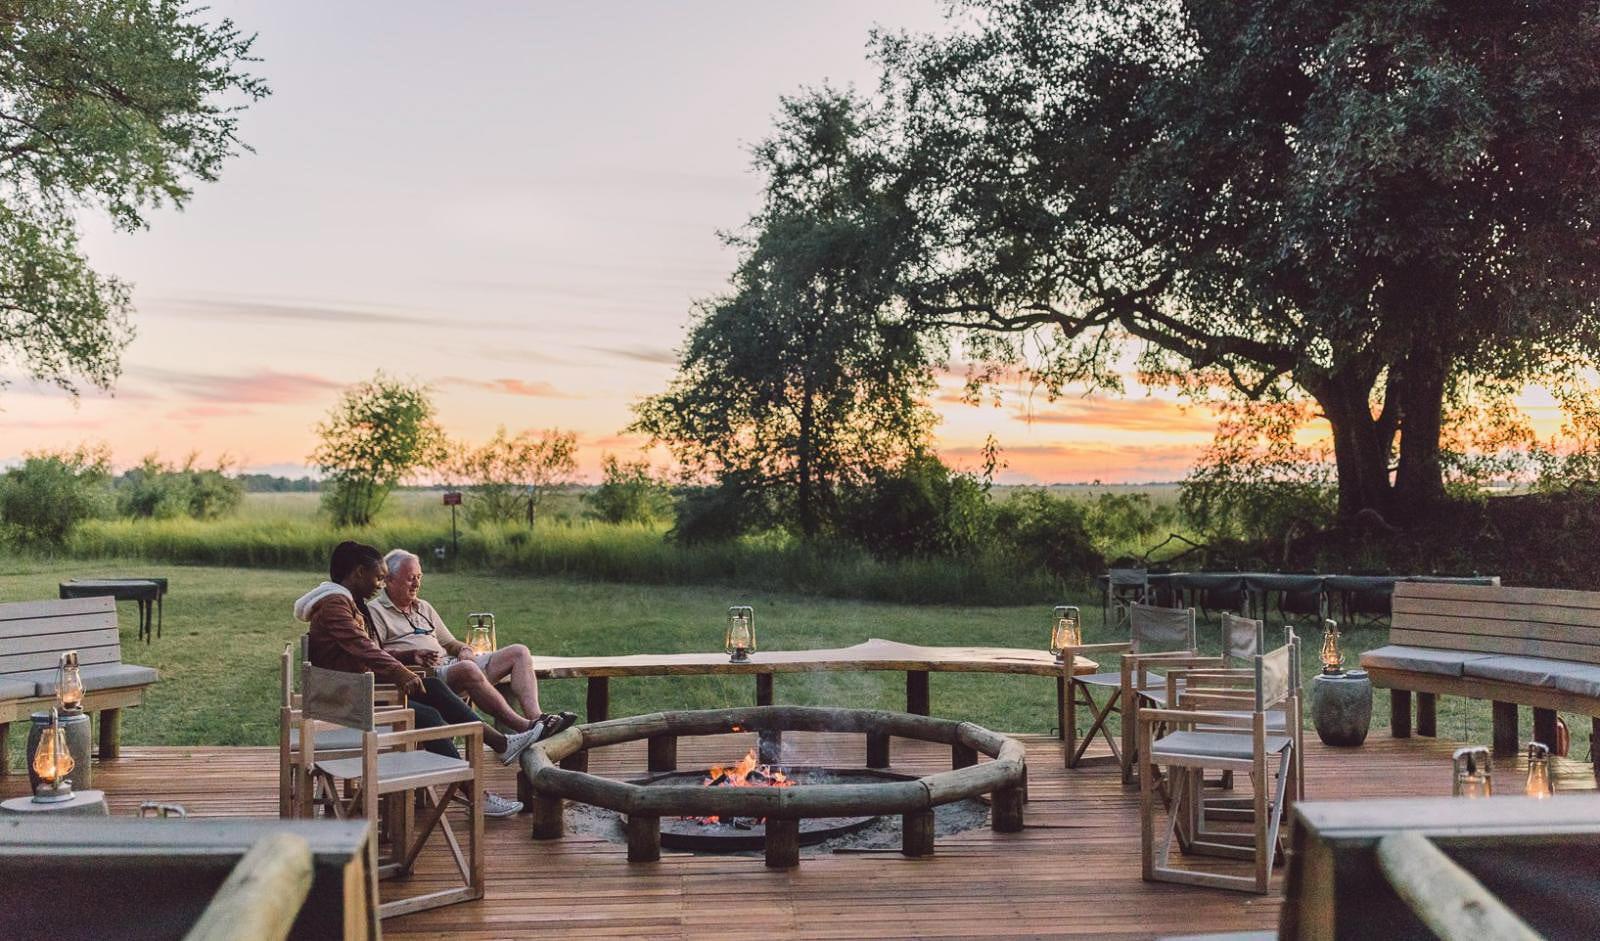 Camp-Moremi-Okavango-Delta-Botswana-14